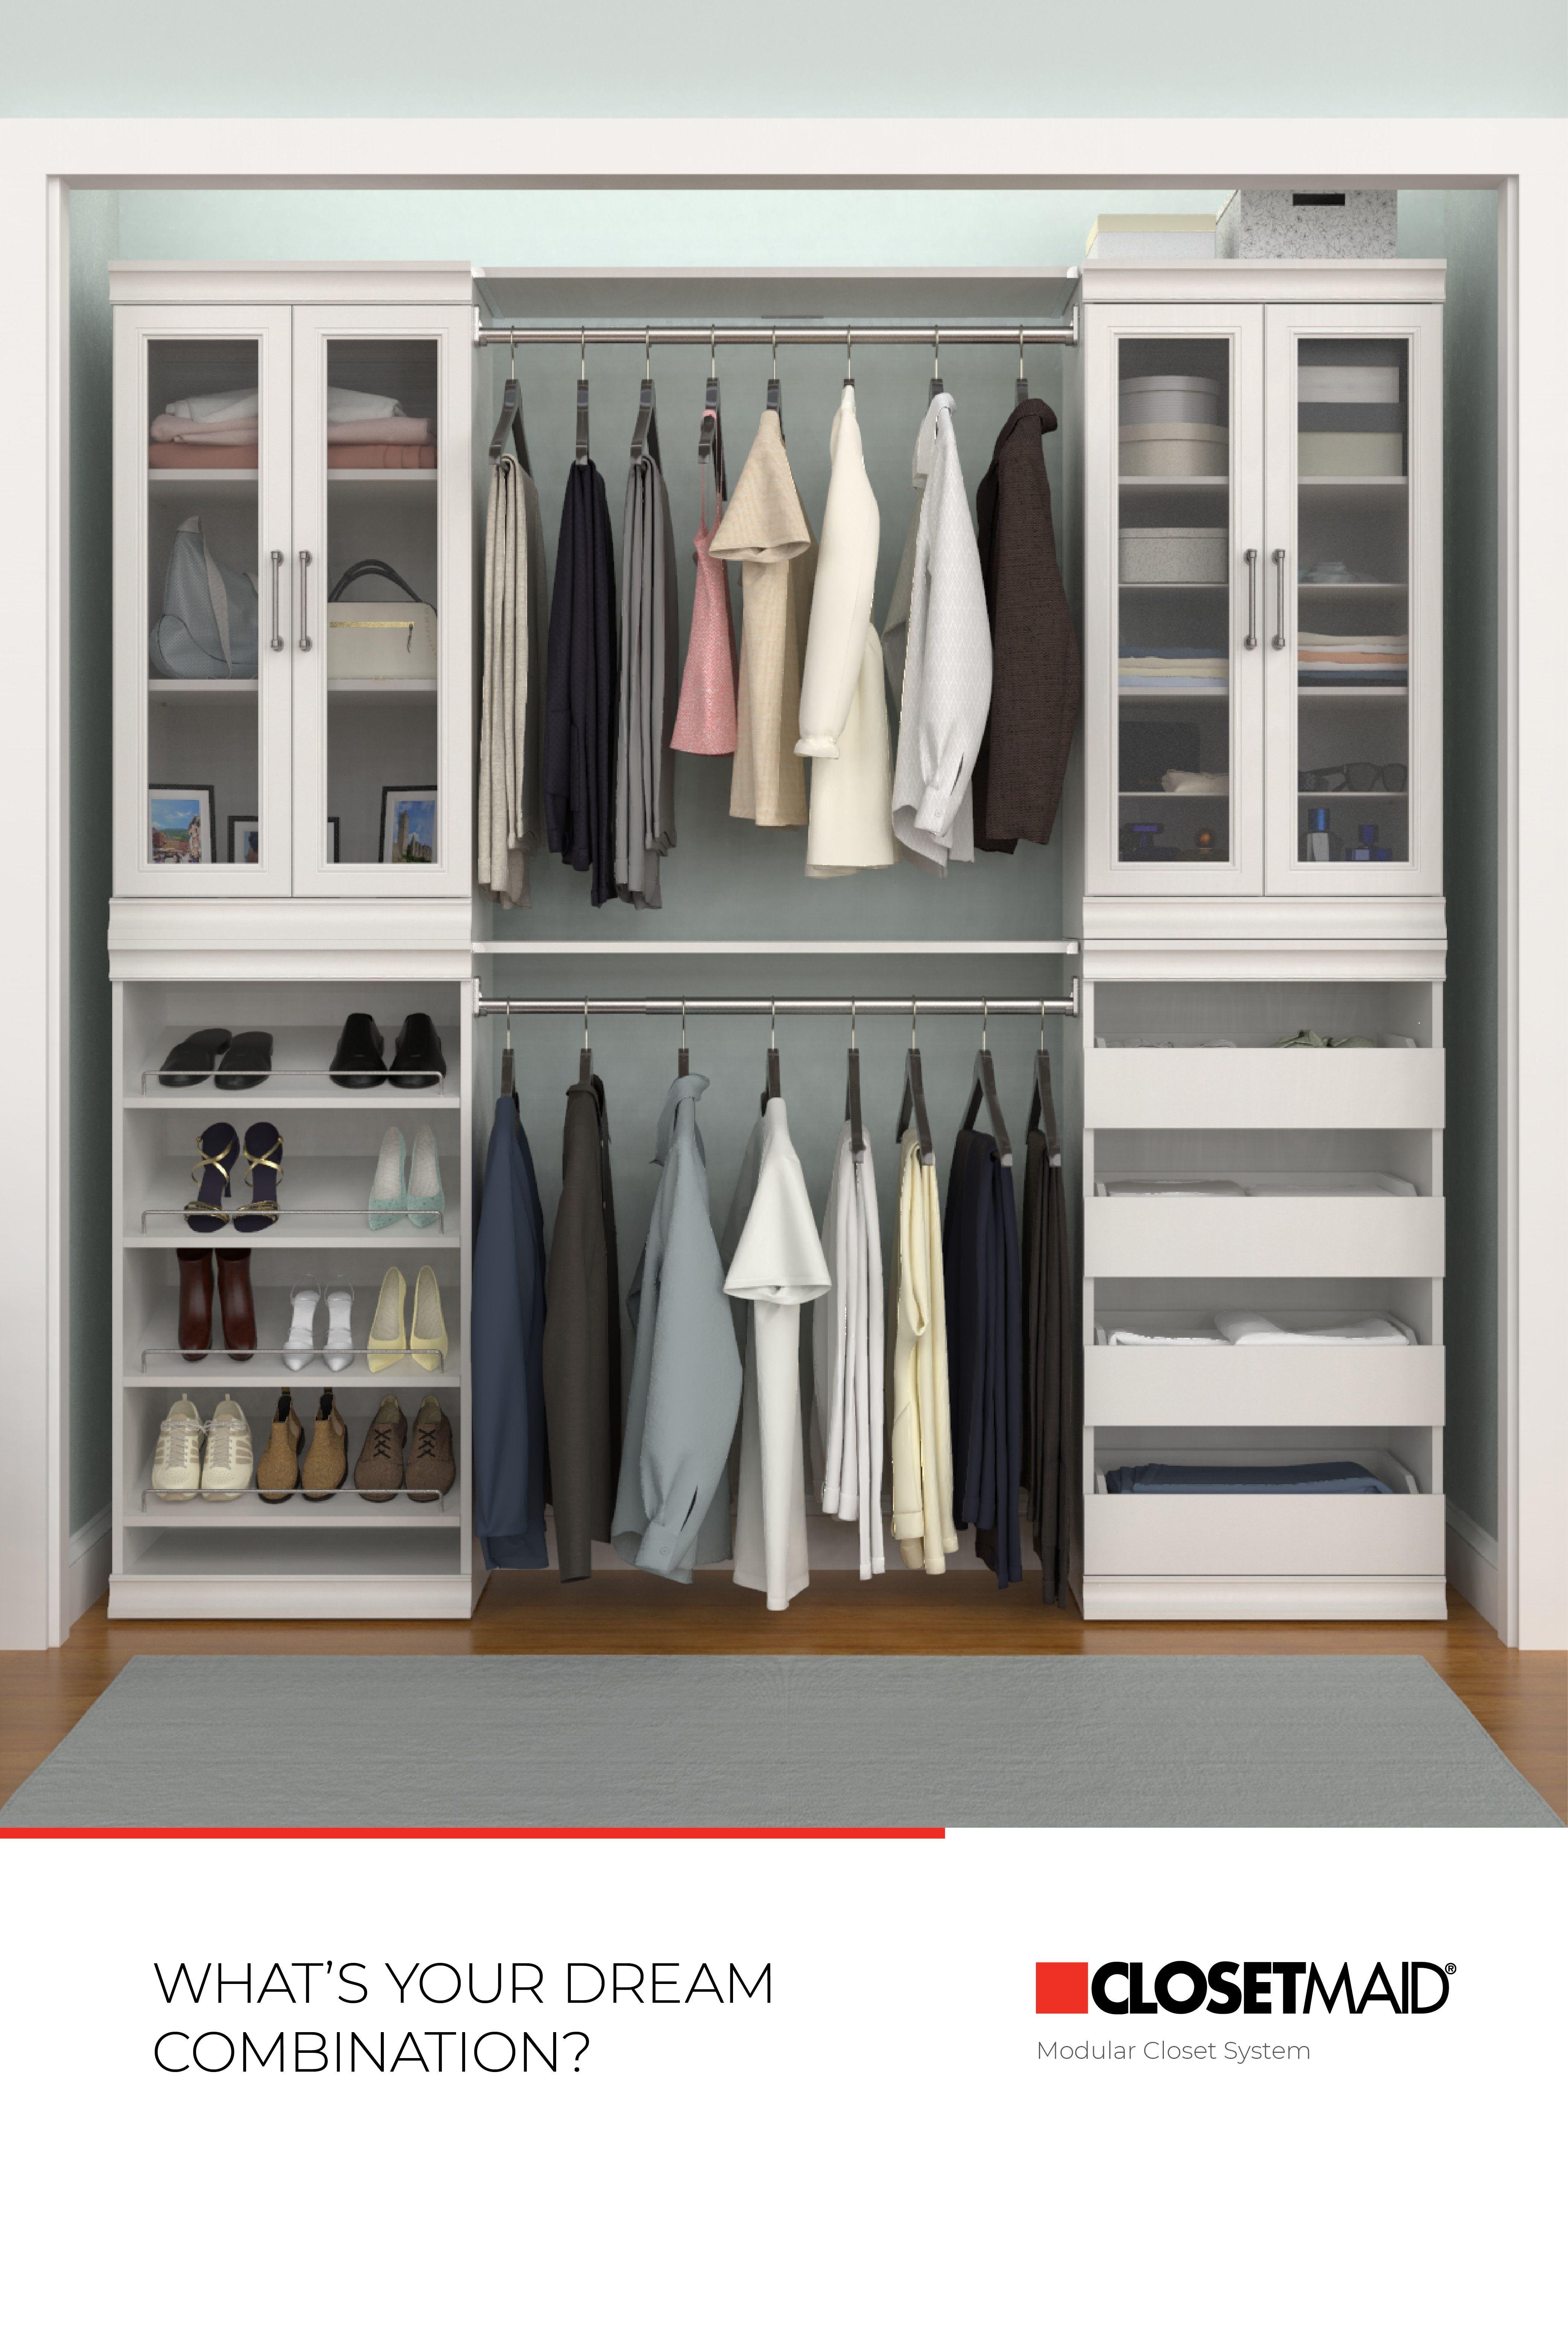 Modular Closet System Closet Storage Systems Modular Bedroom Modular Closet Systems